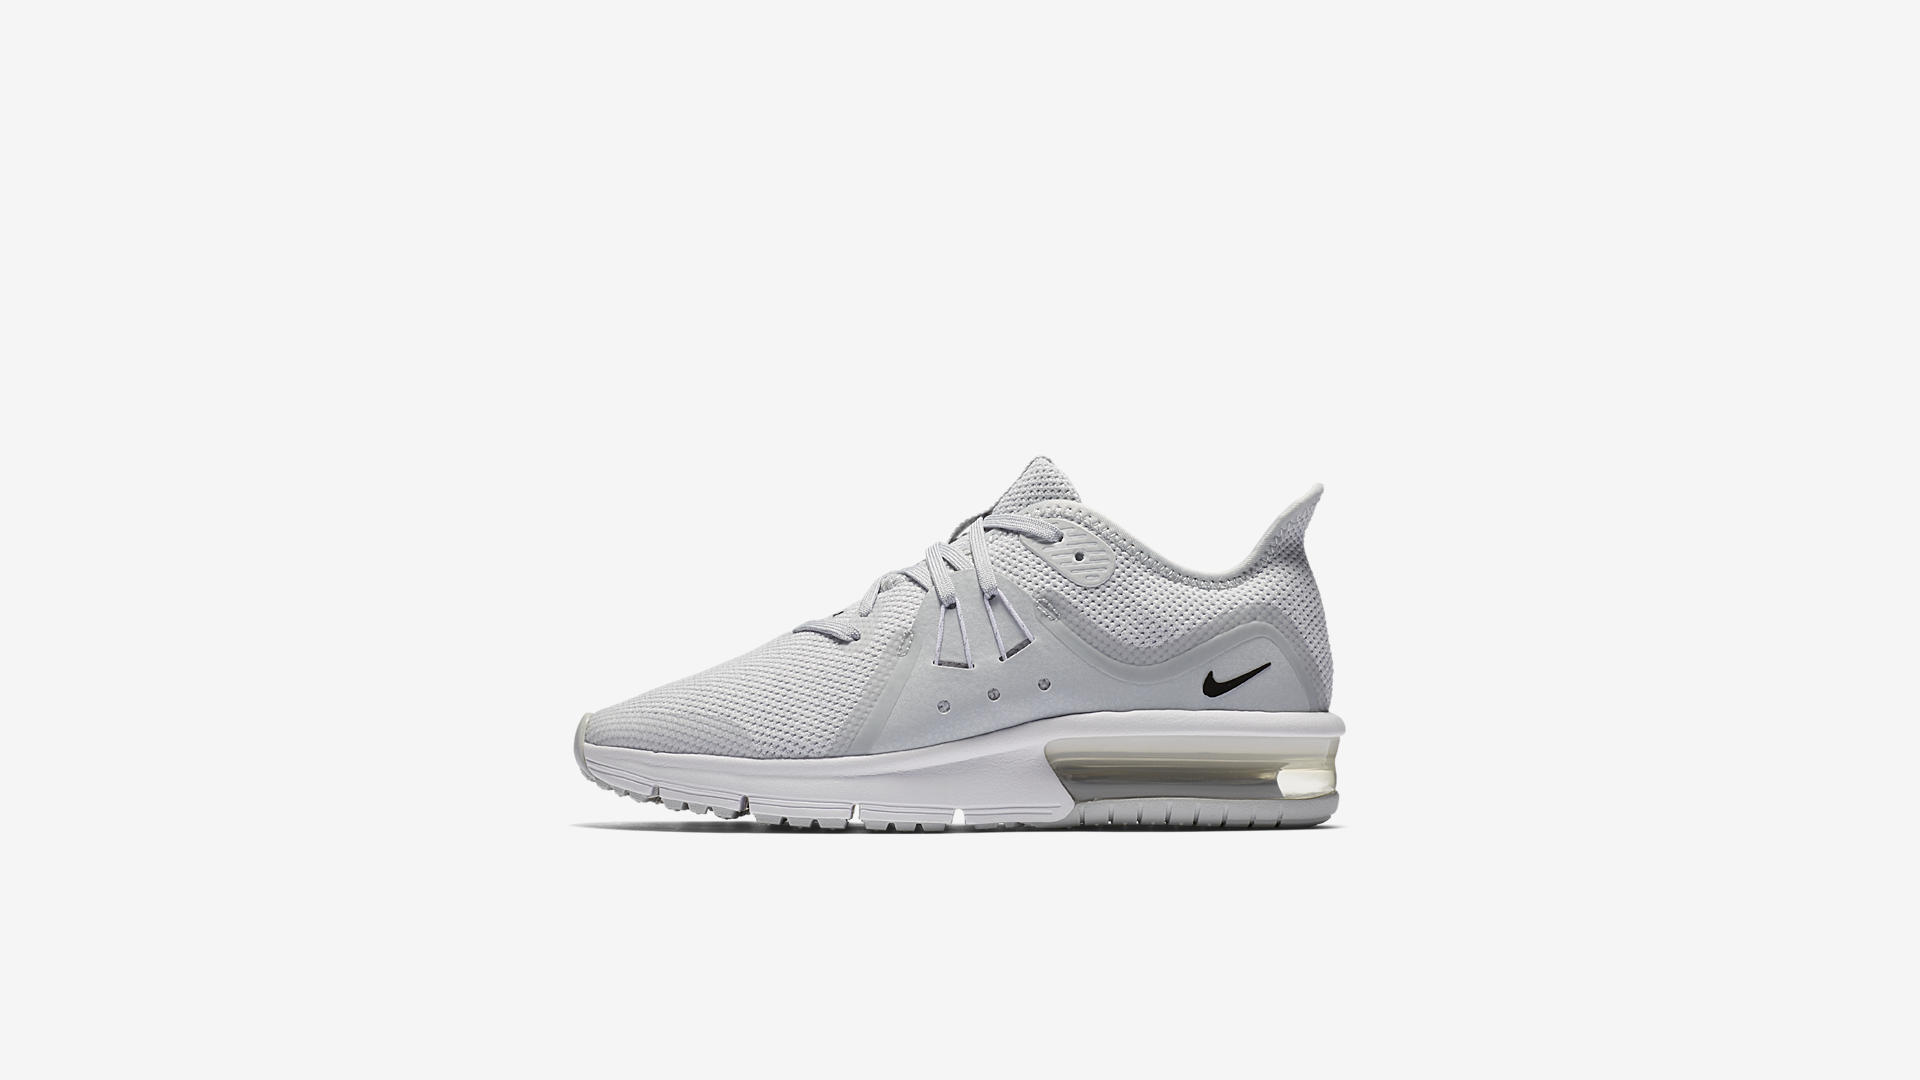 ccb38895755 Nike Air Max Sequent 3 Kinderschoen - Zilver   922884-005   Nike